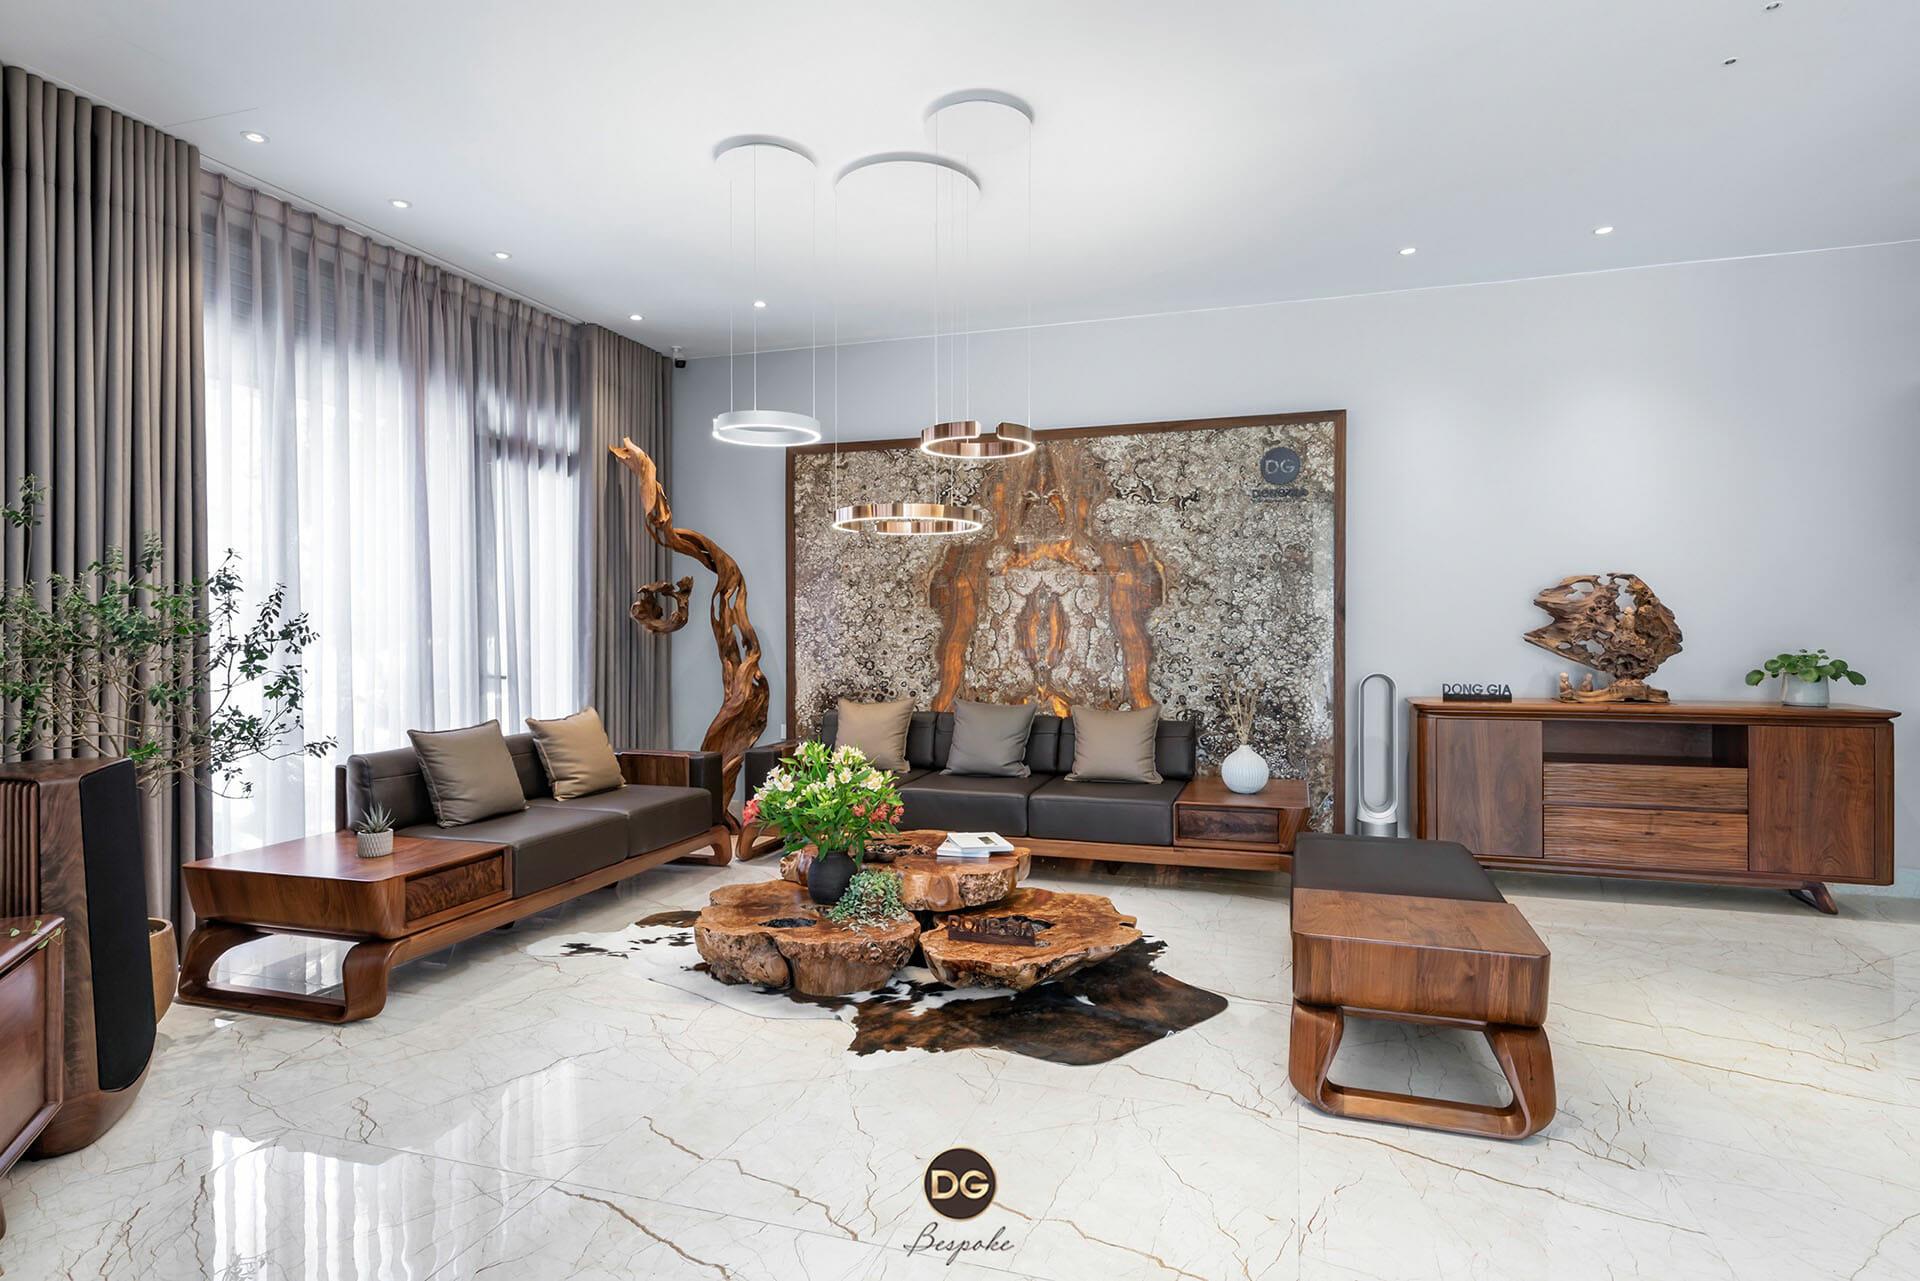 bo-sofa-rolls-showroomdg-2020